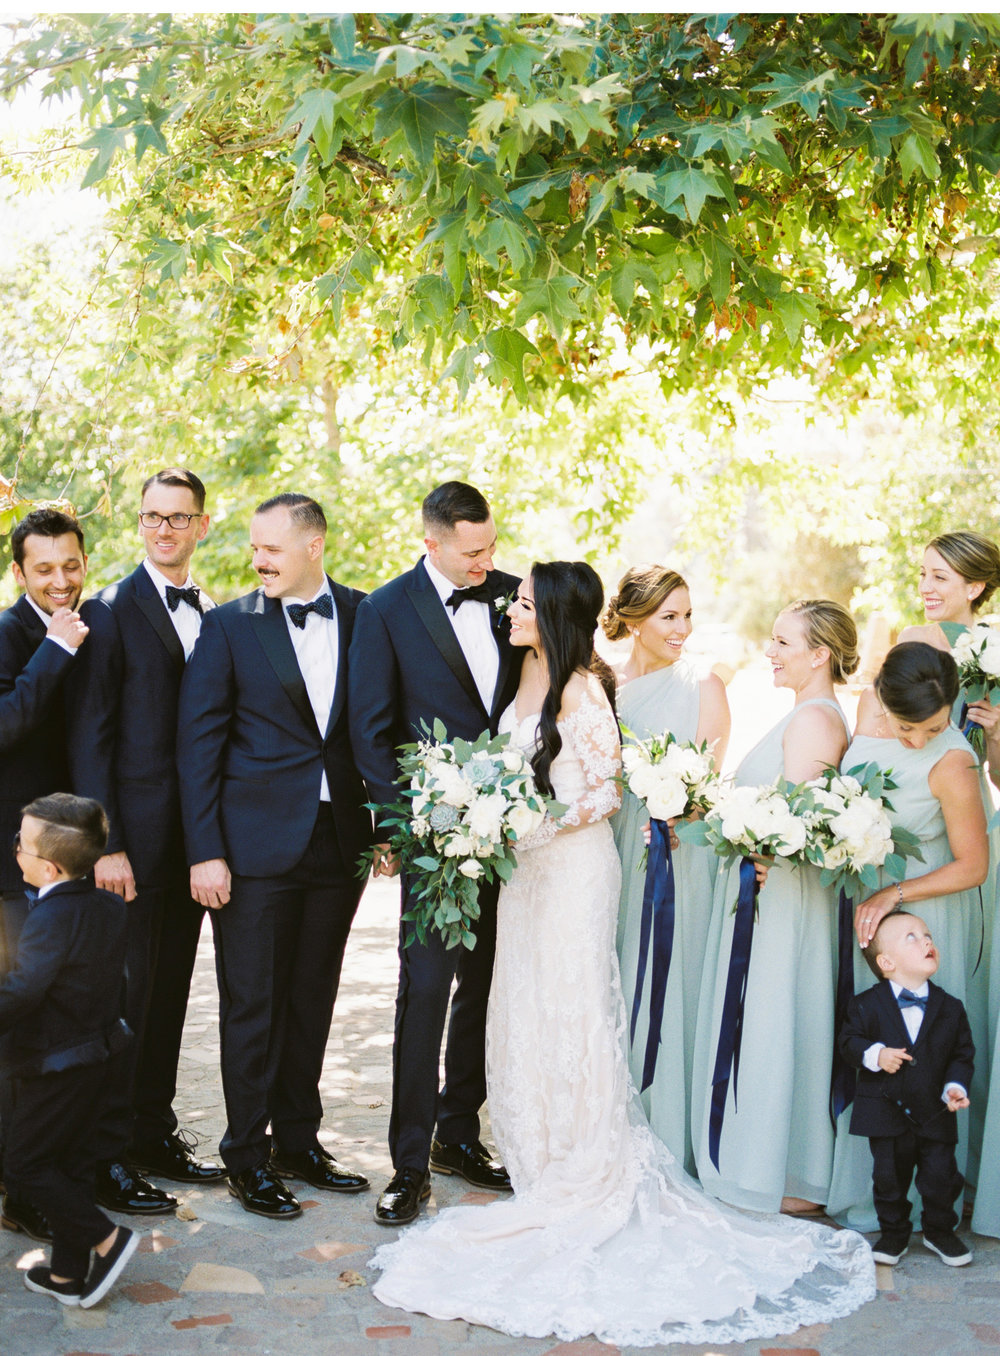 Southern-California-Weddings-Natalie-Schutt-Photography-Weddings_11.jpg